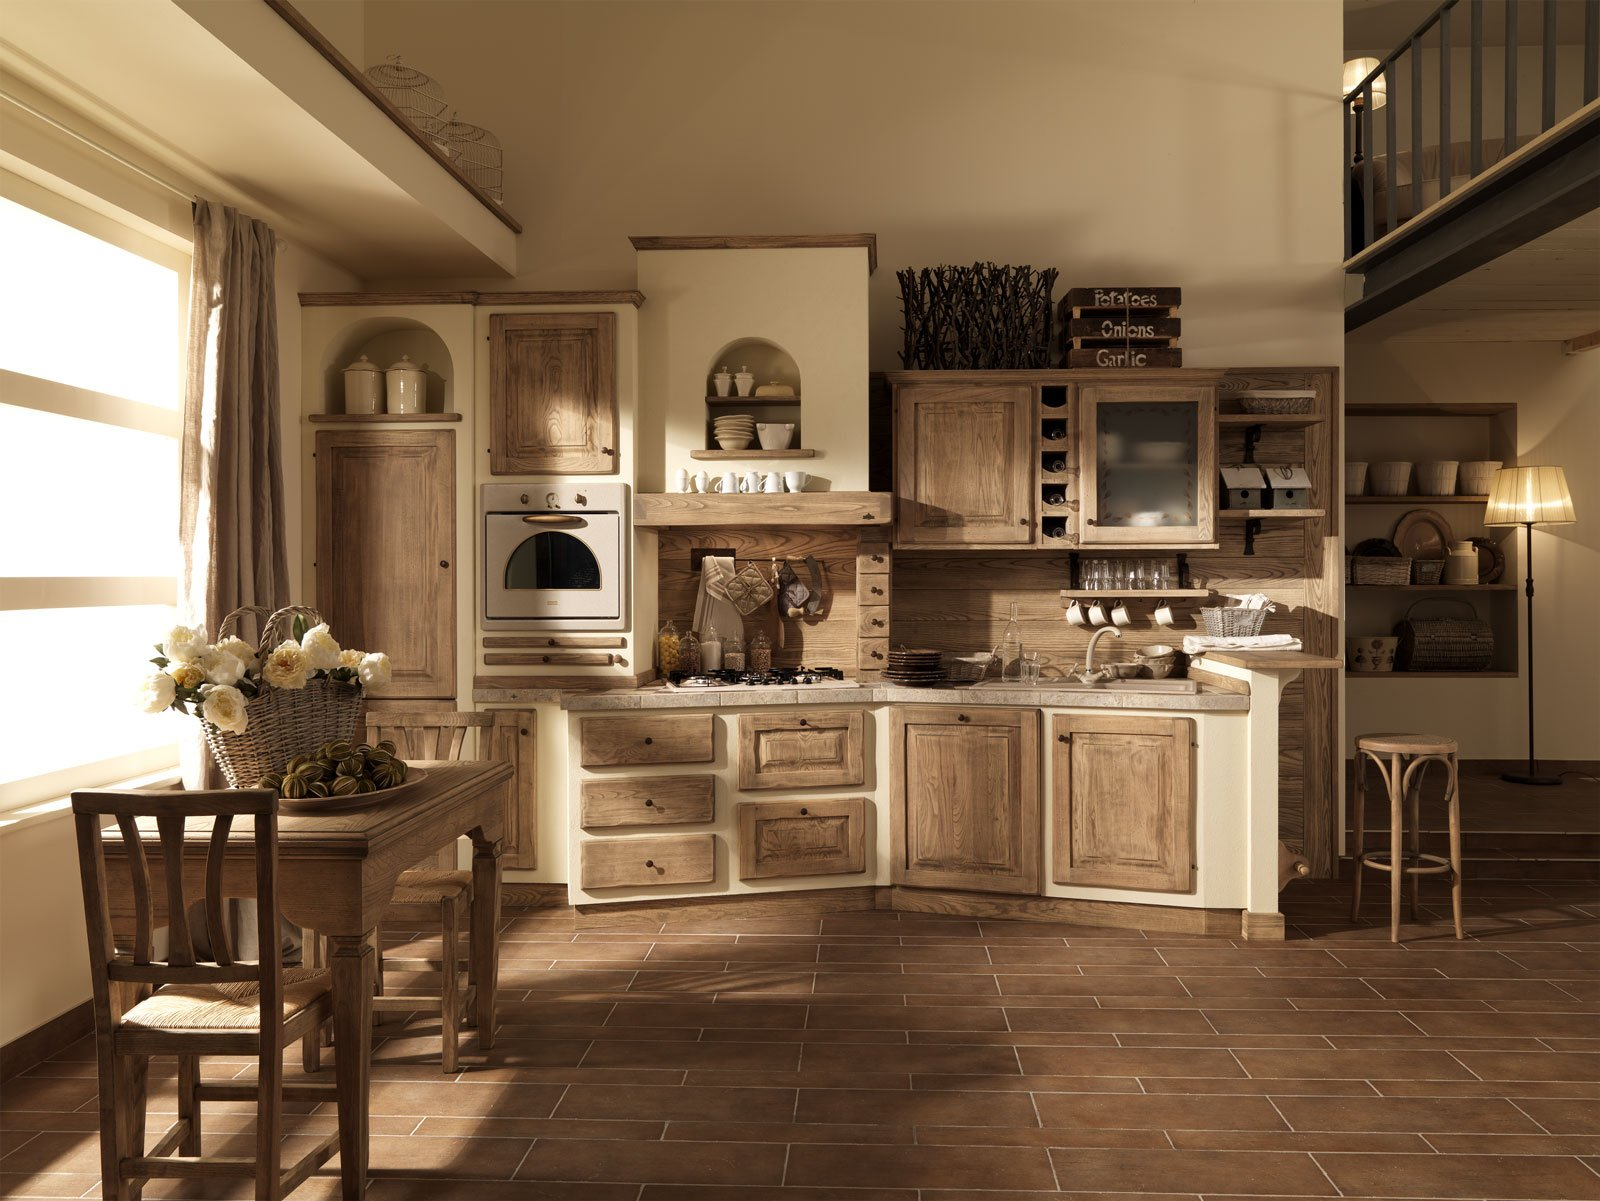 Cucine effetto muratura vera o finta cose di casa - Cucine in muratura lube ...